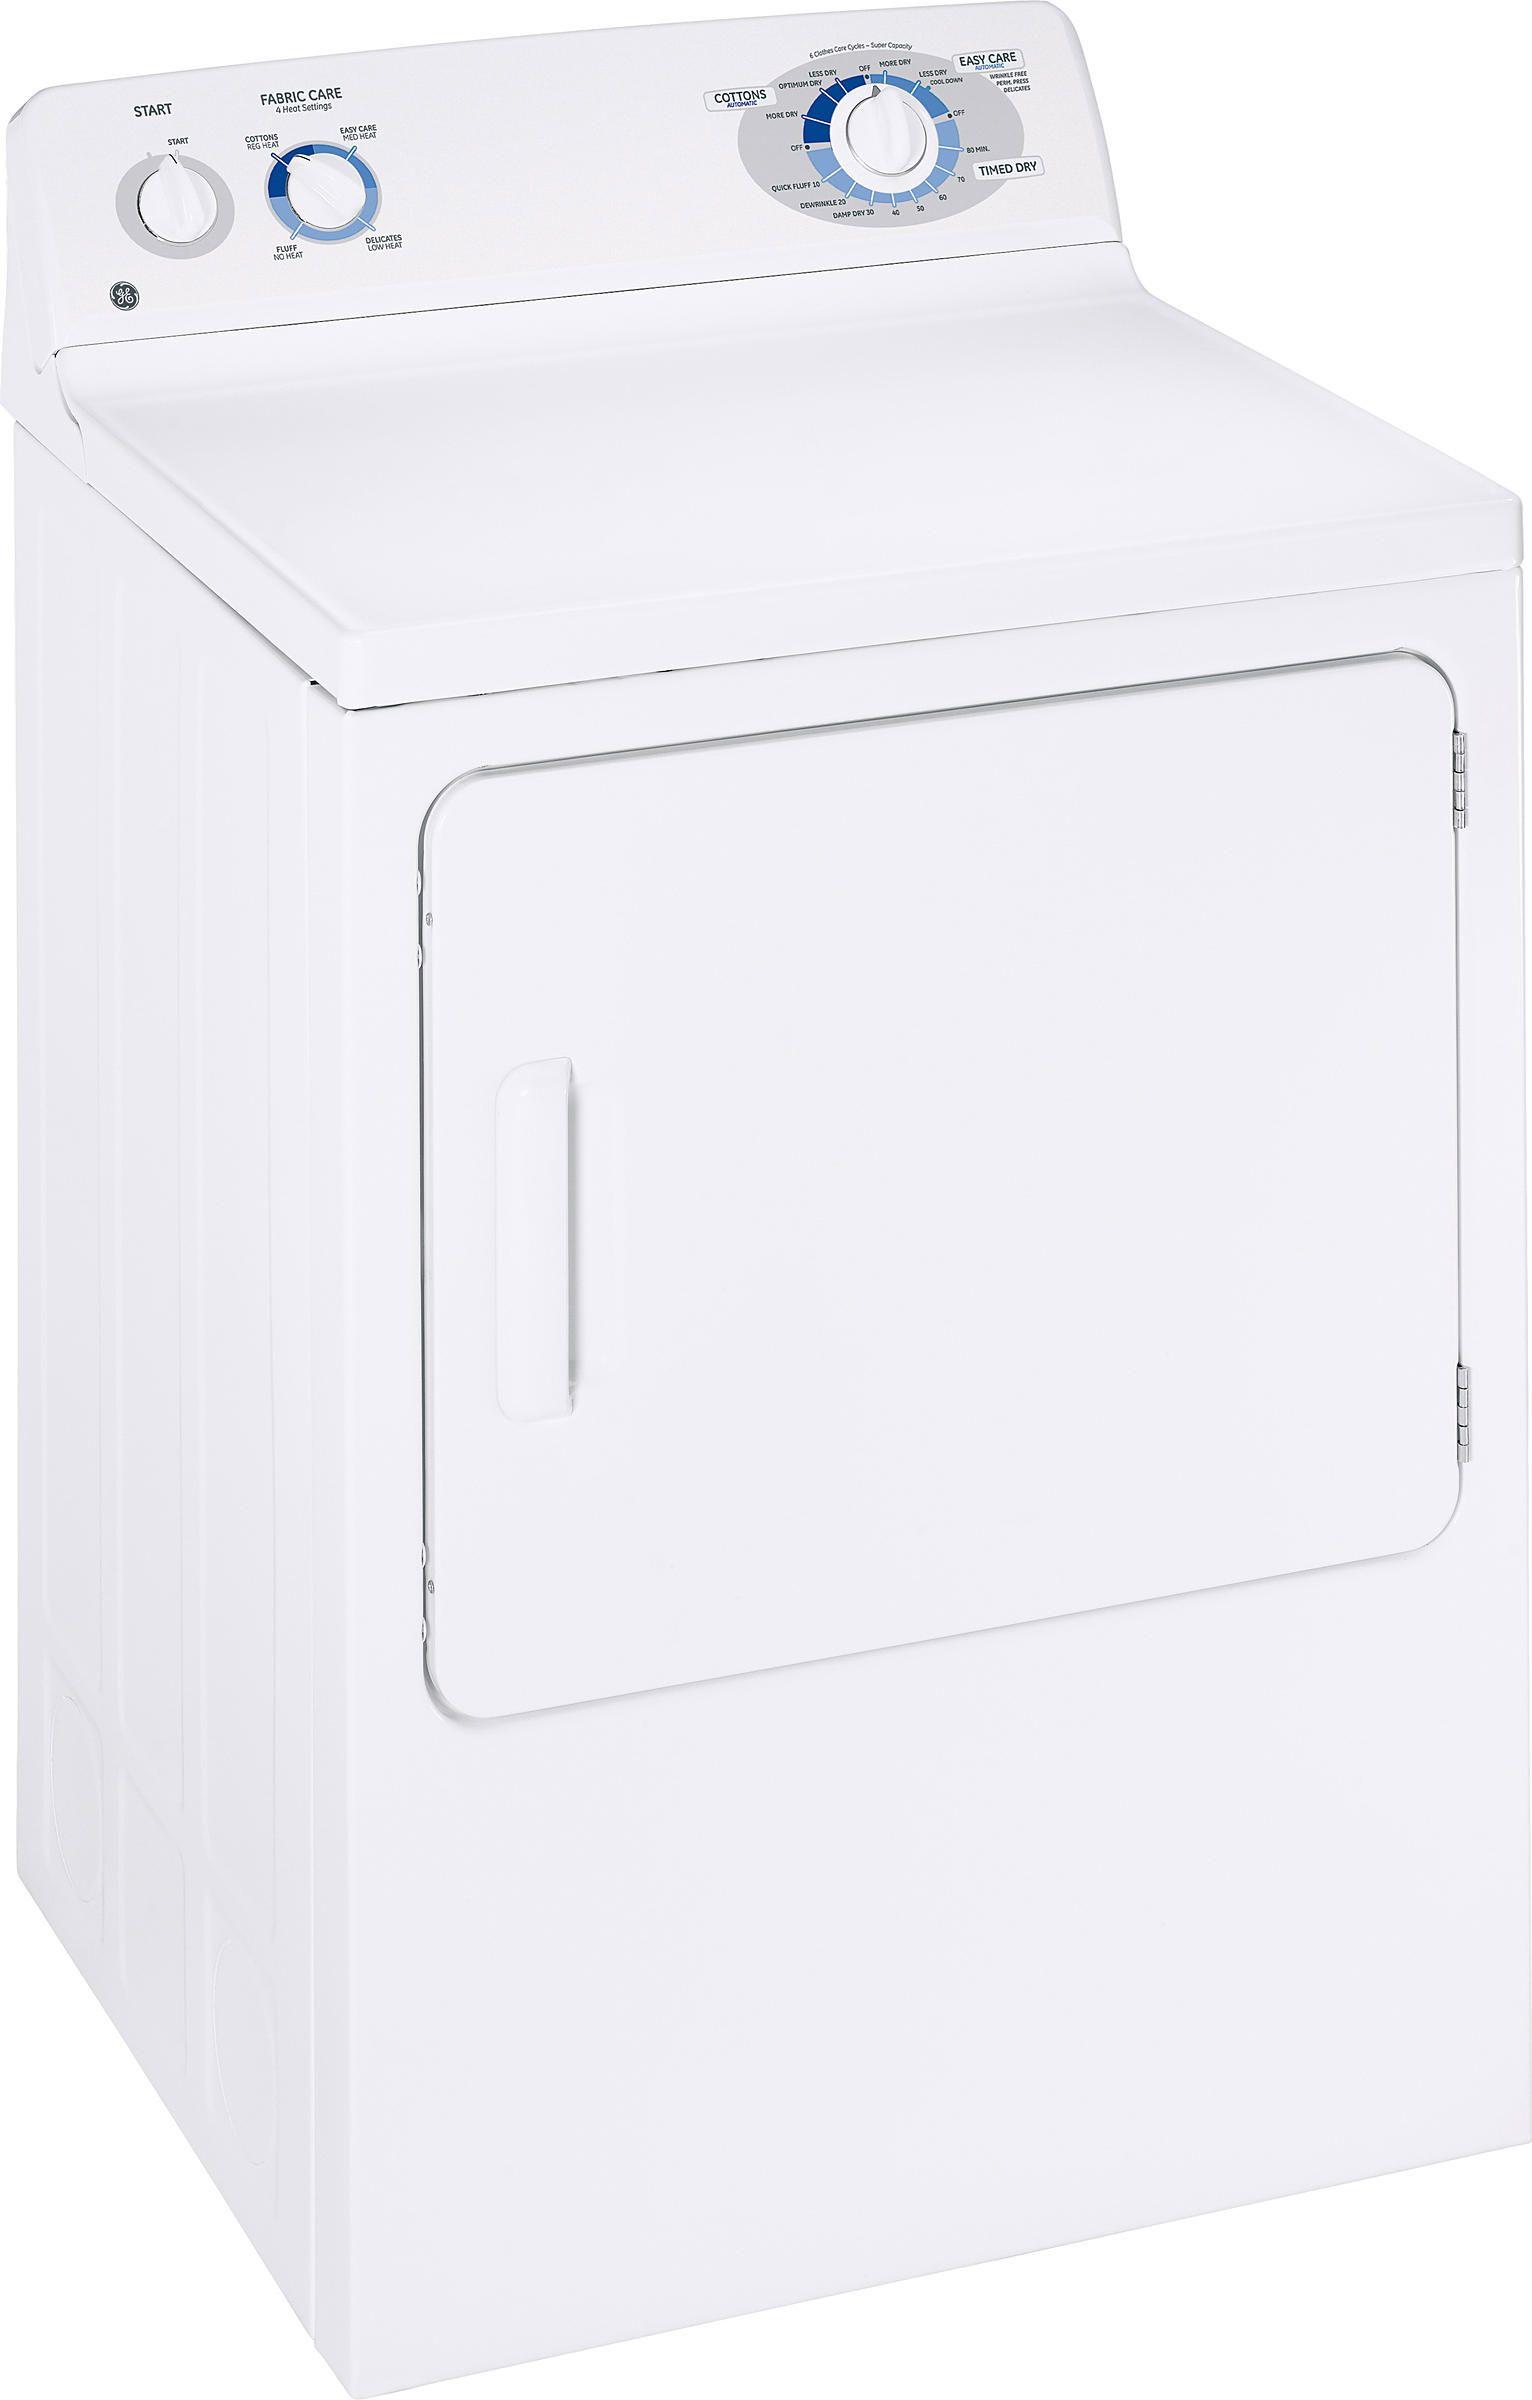 ge model dbxr463eg1ww residential dryer genuine parts rh searspartsdirect com ge dryer repair manual ge front [ 1532 x 2400 Pixel ]